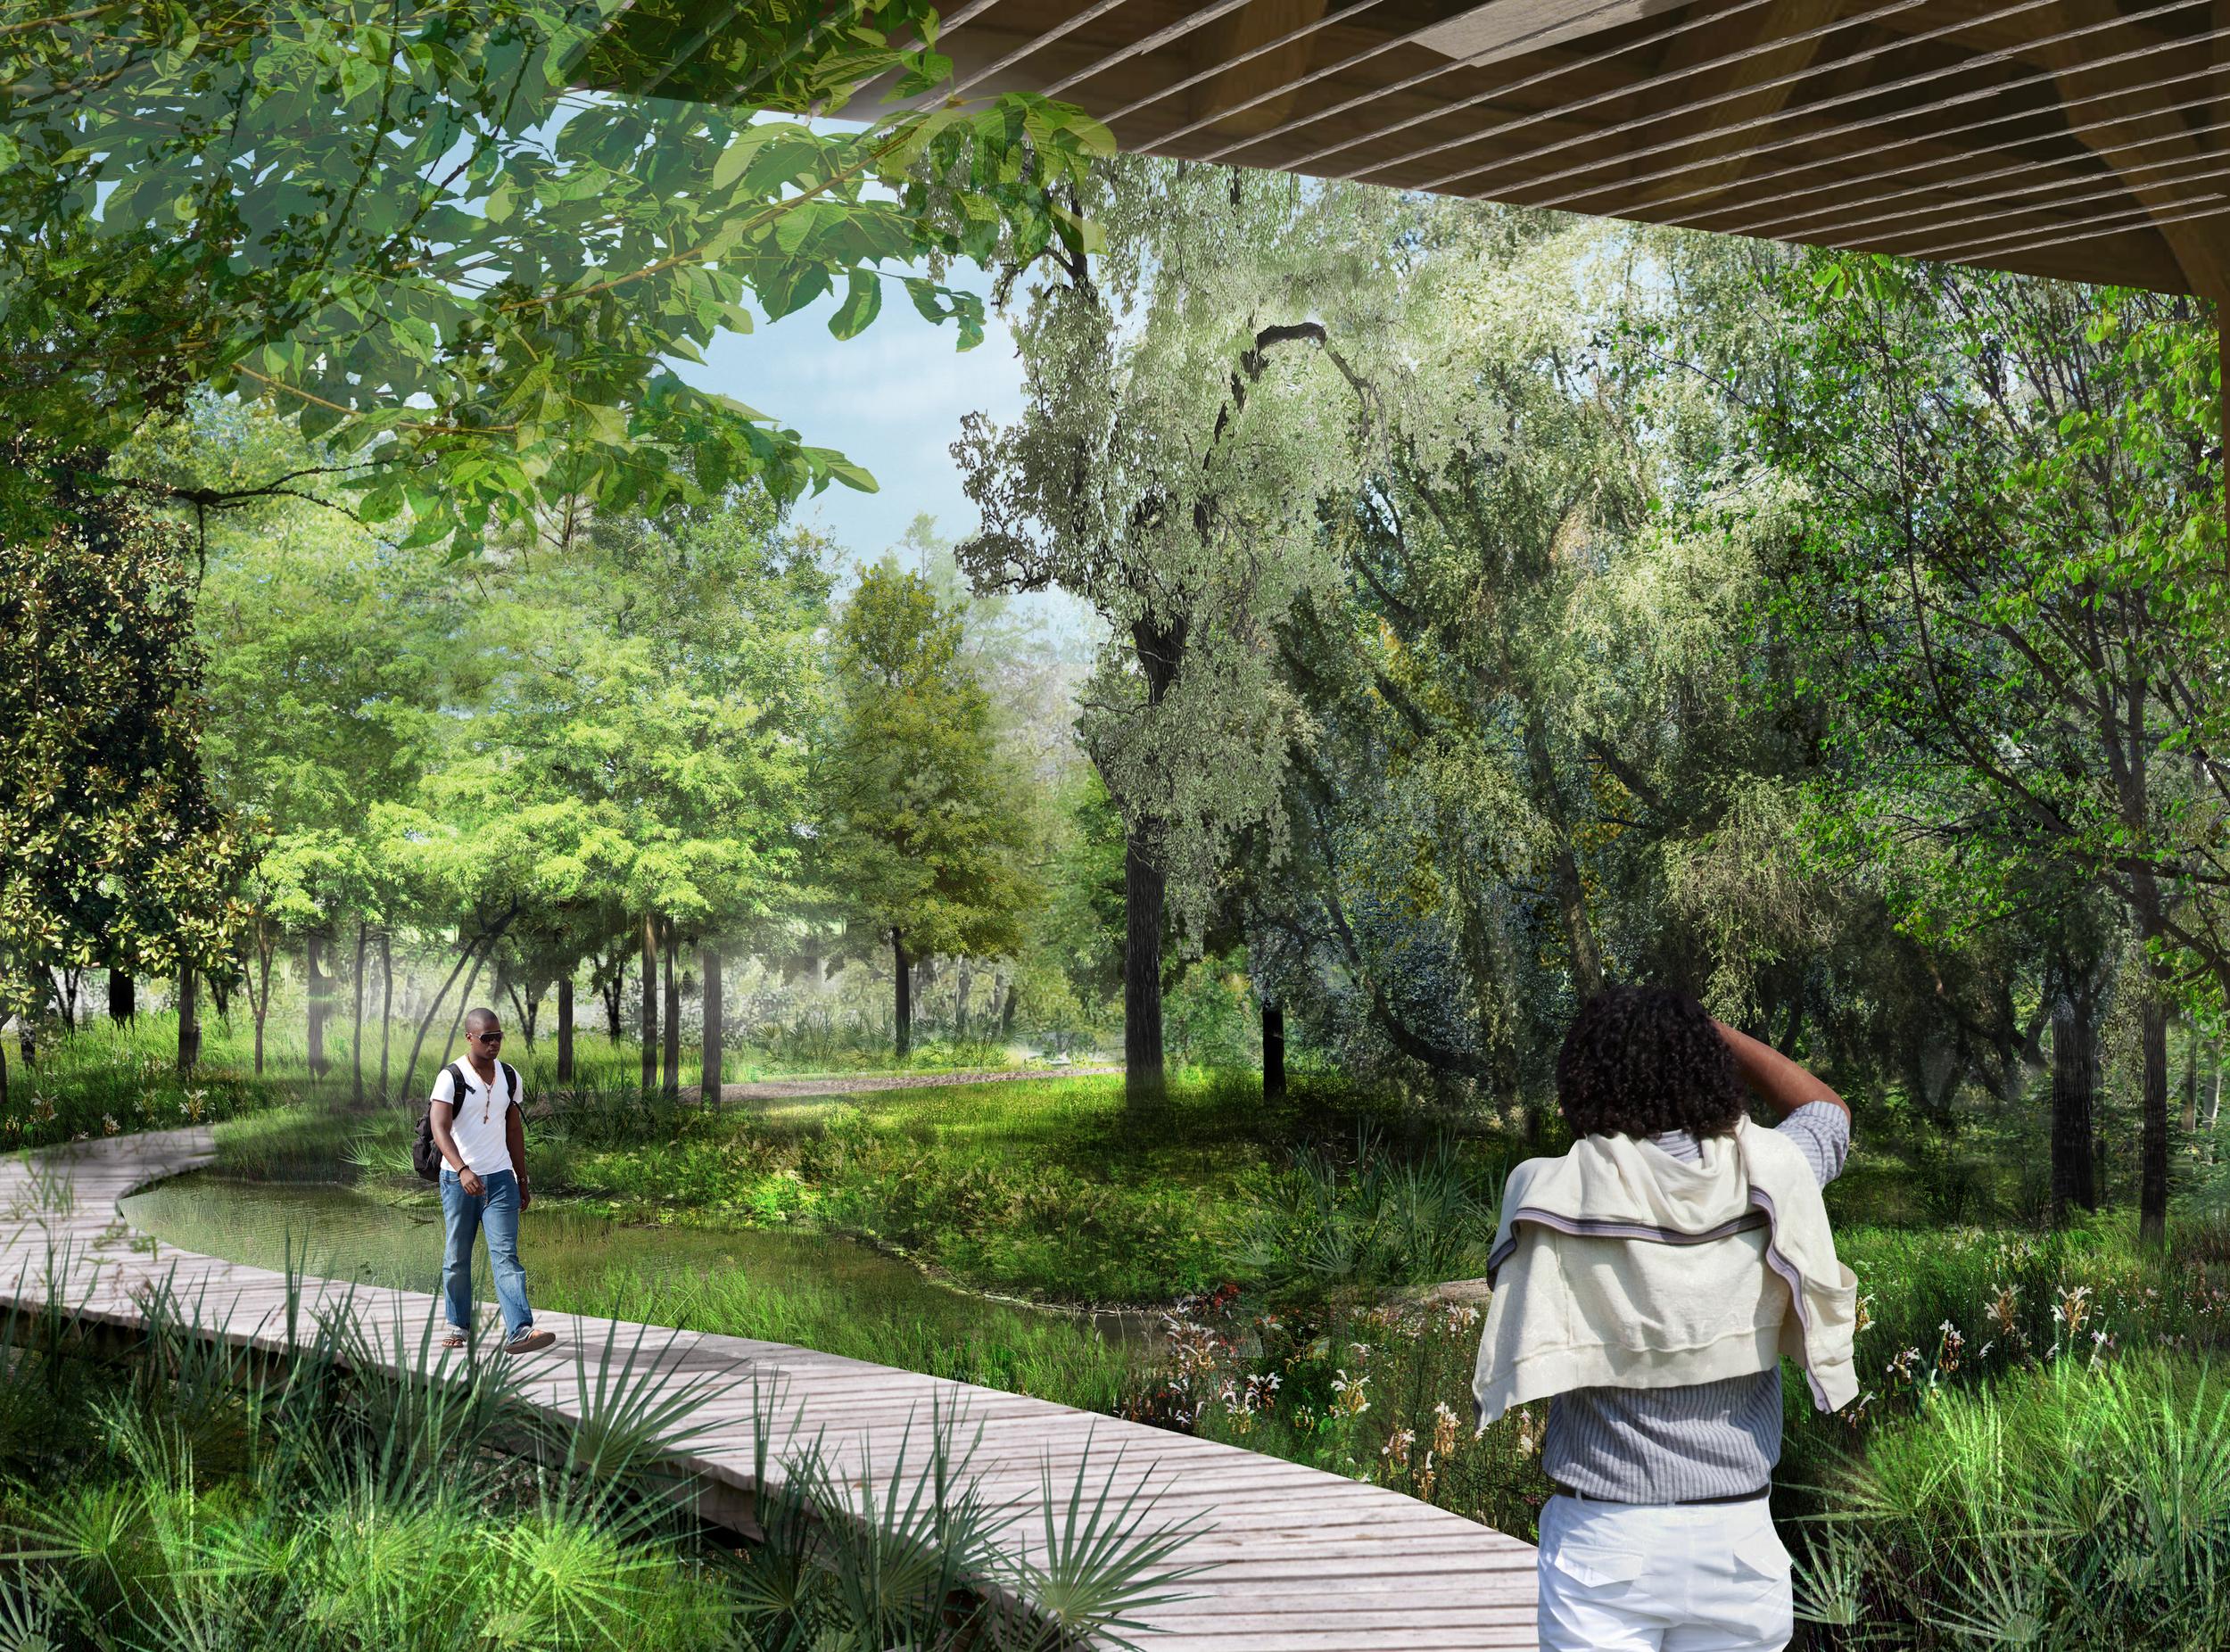 Houston Arboretum and Nature Center bog perspective